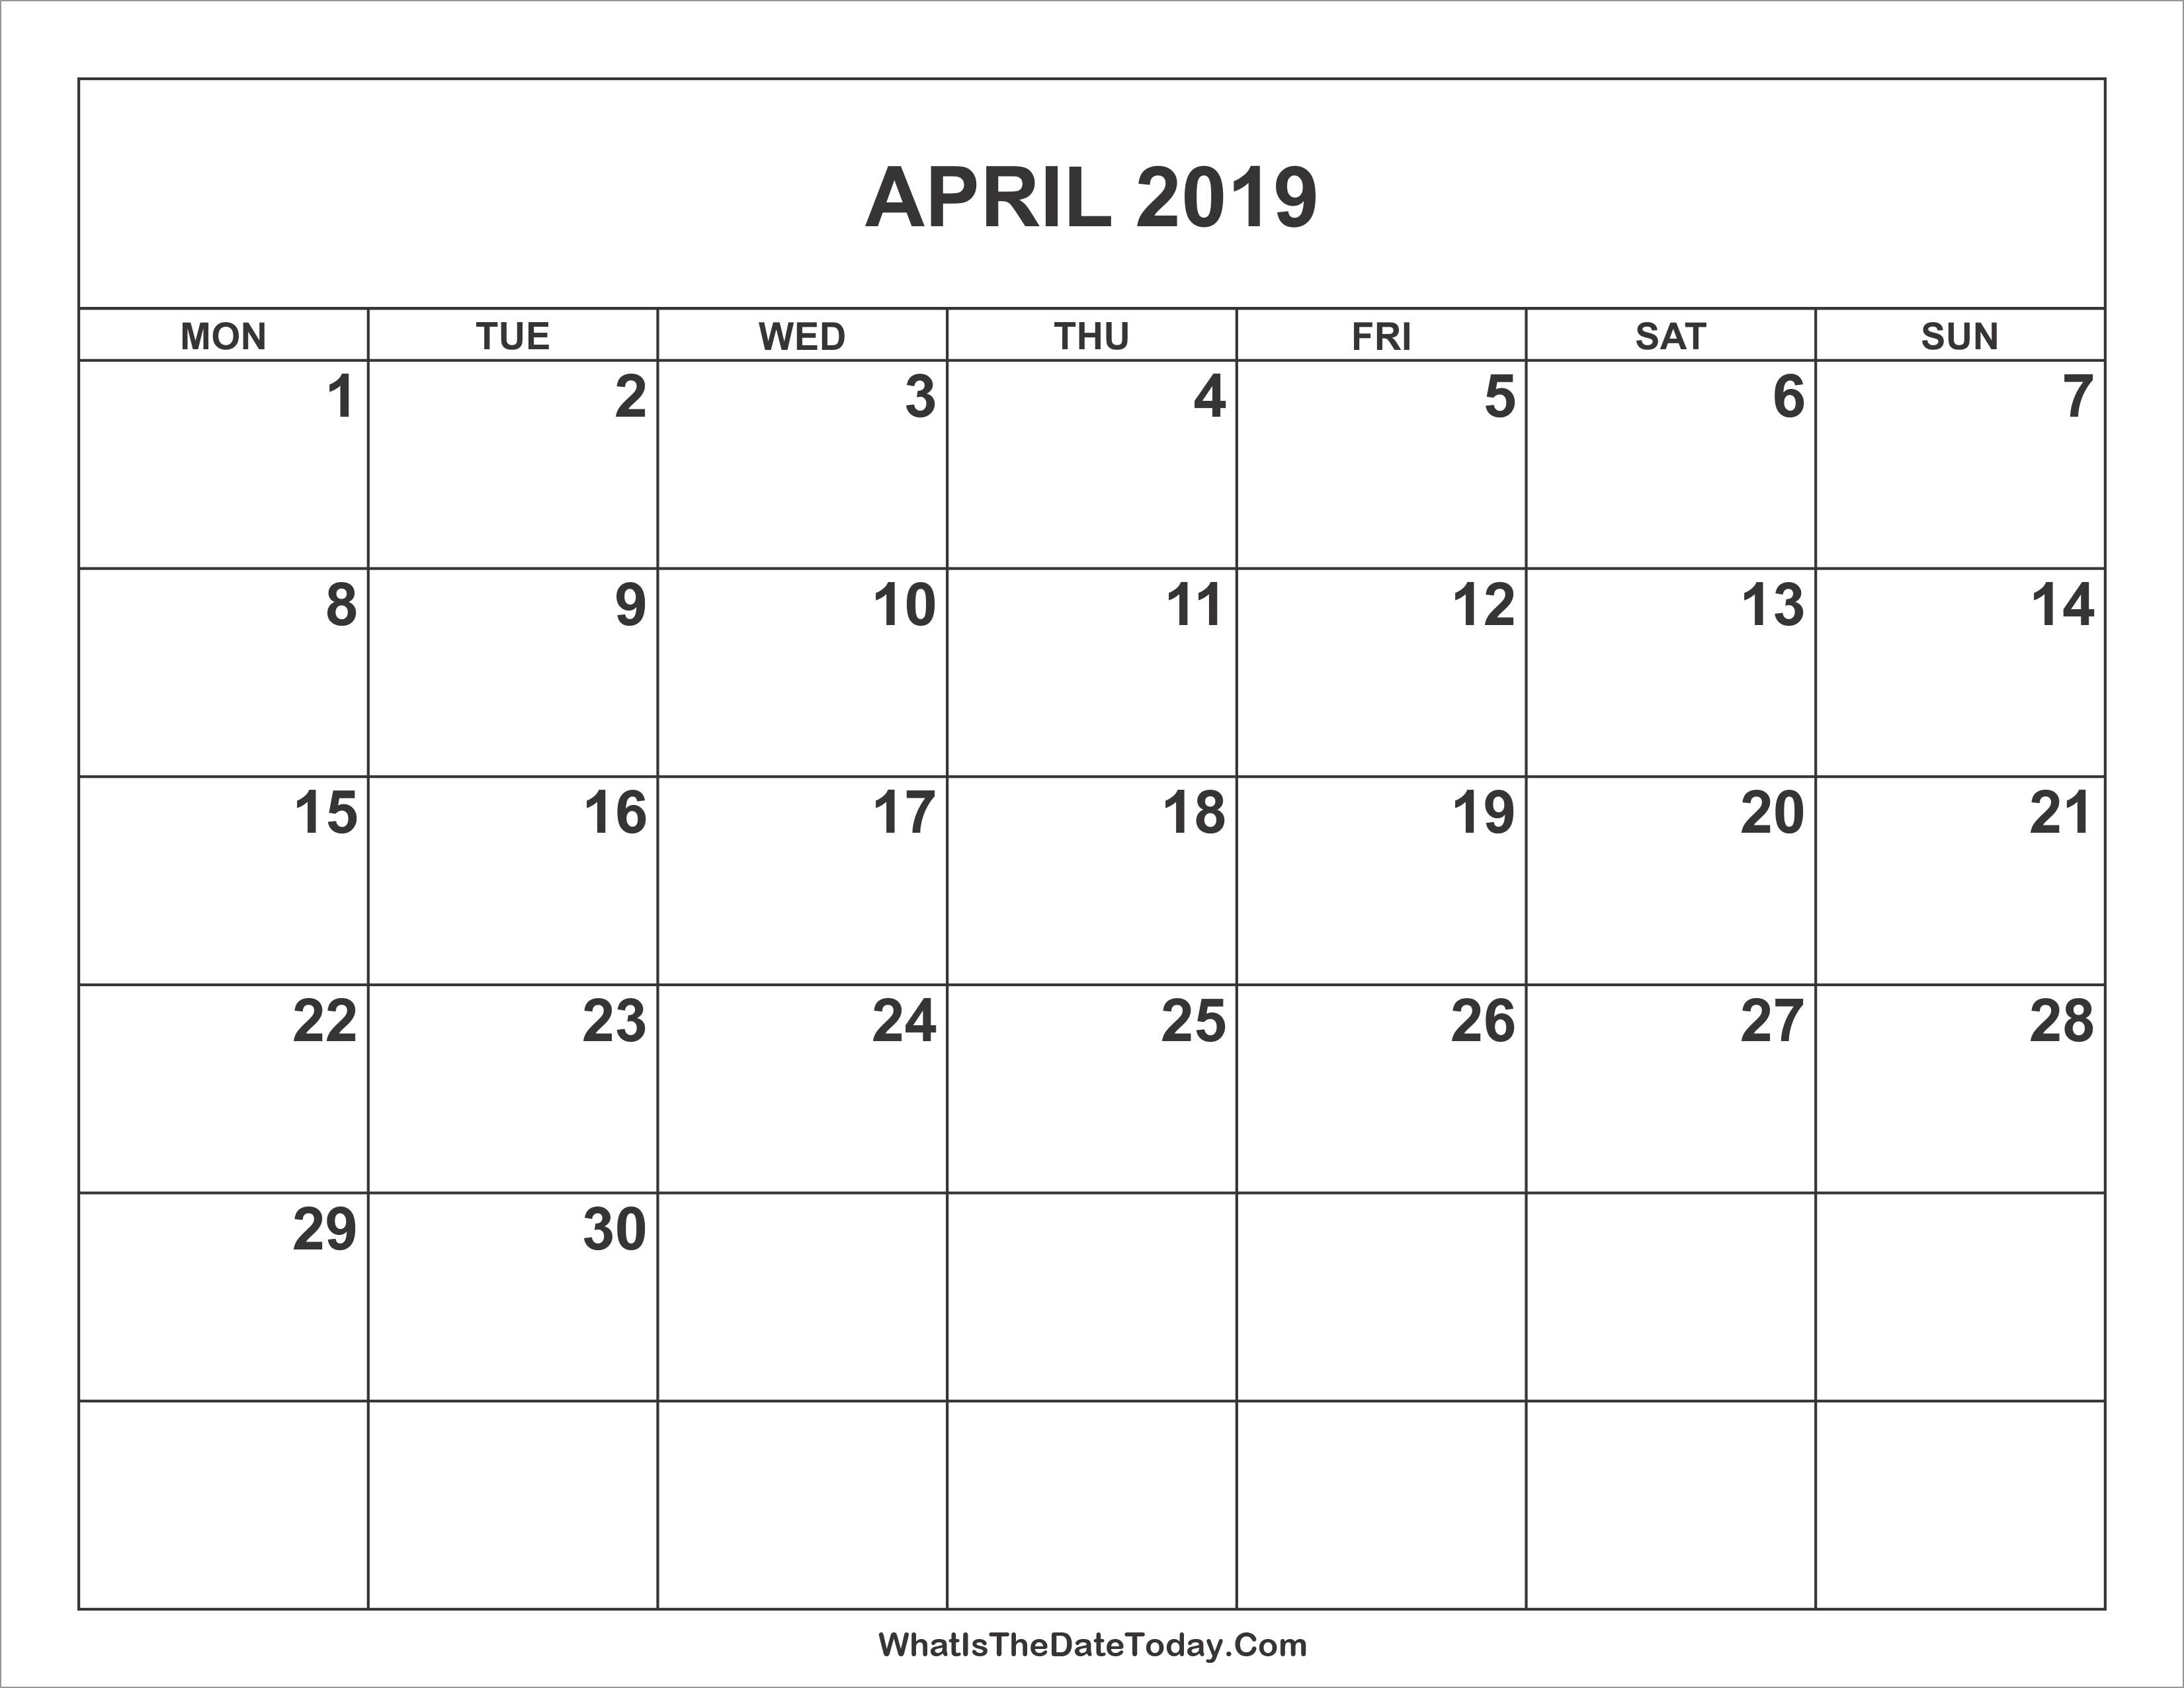 Calendar 2019 February Through April Más Arriba-a-fecha April 2019 Calendar Word April 2019 Calendar